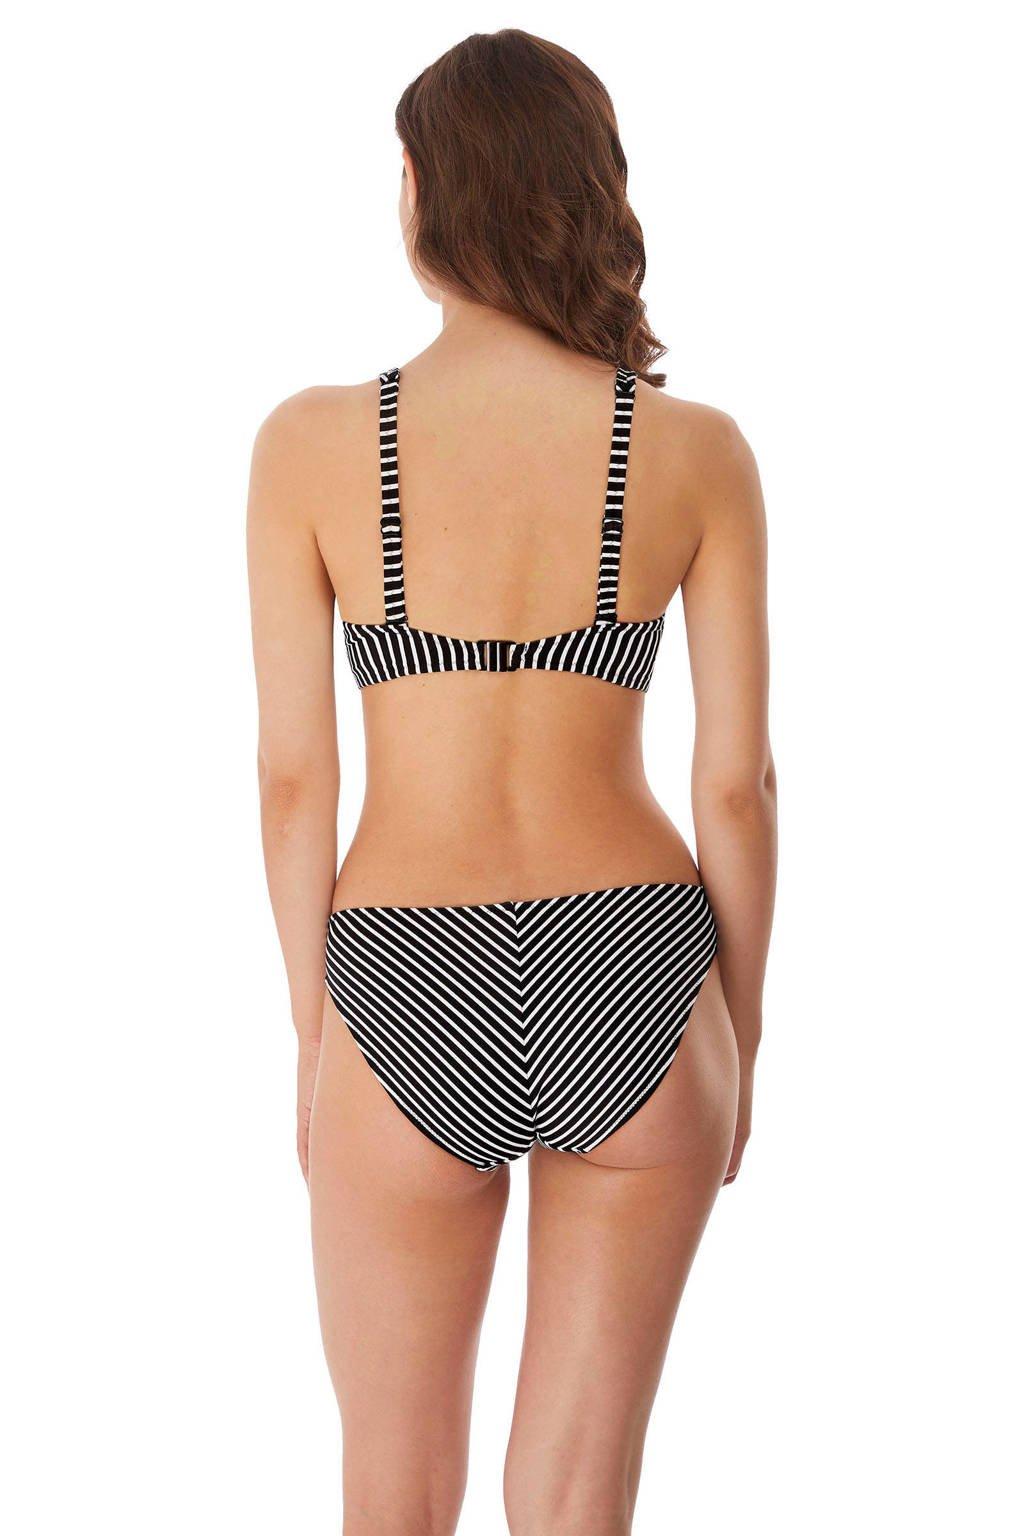 Freya gestreept bikinibroekje Beach Hut zwart/wit, Zwart/wit